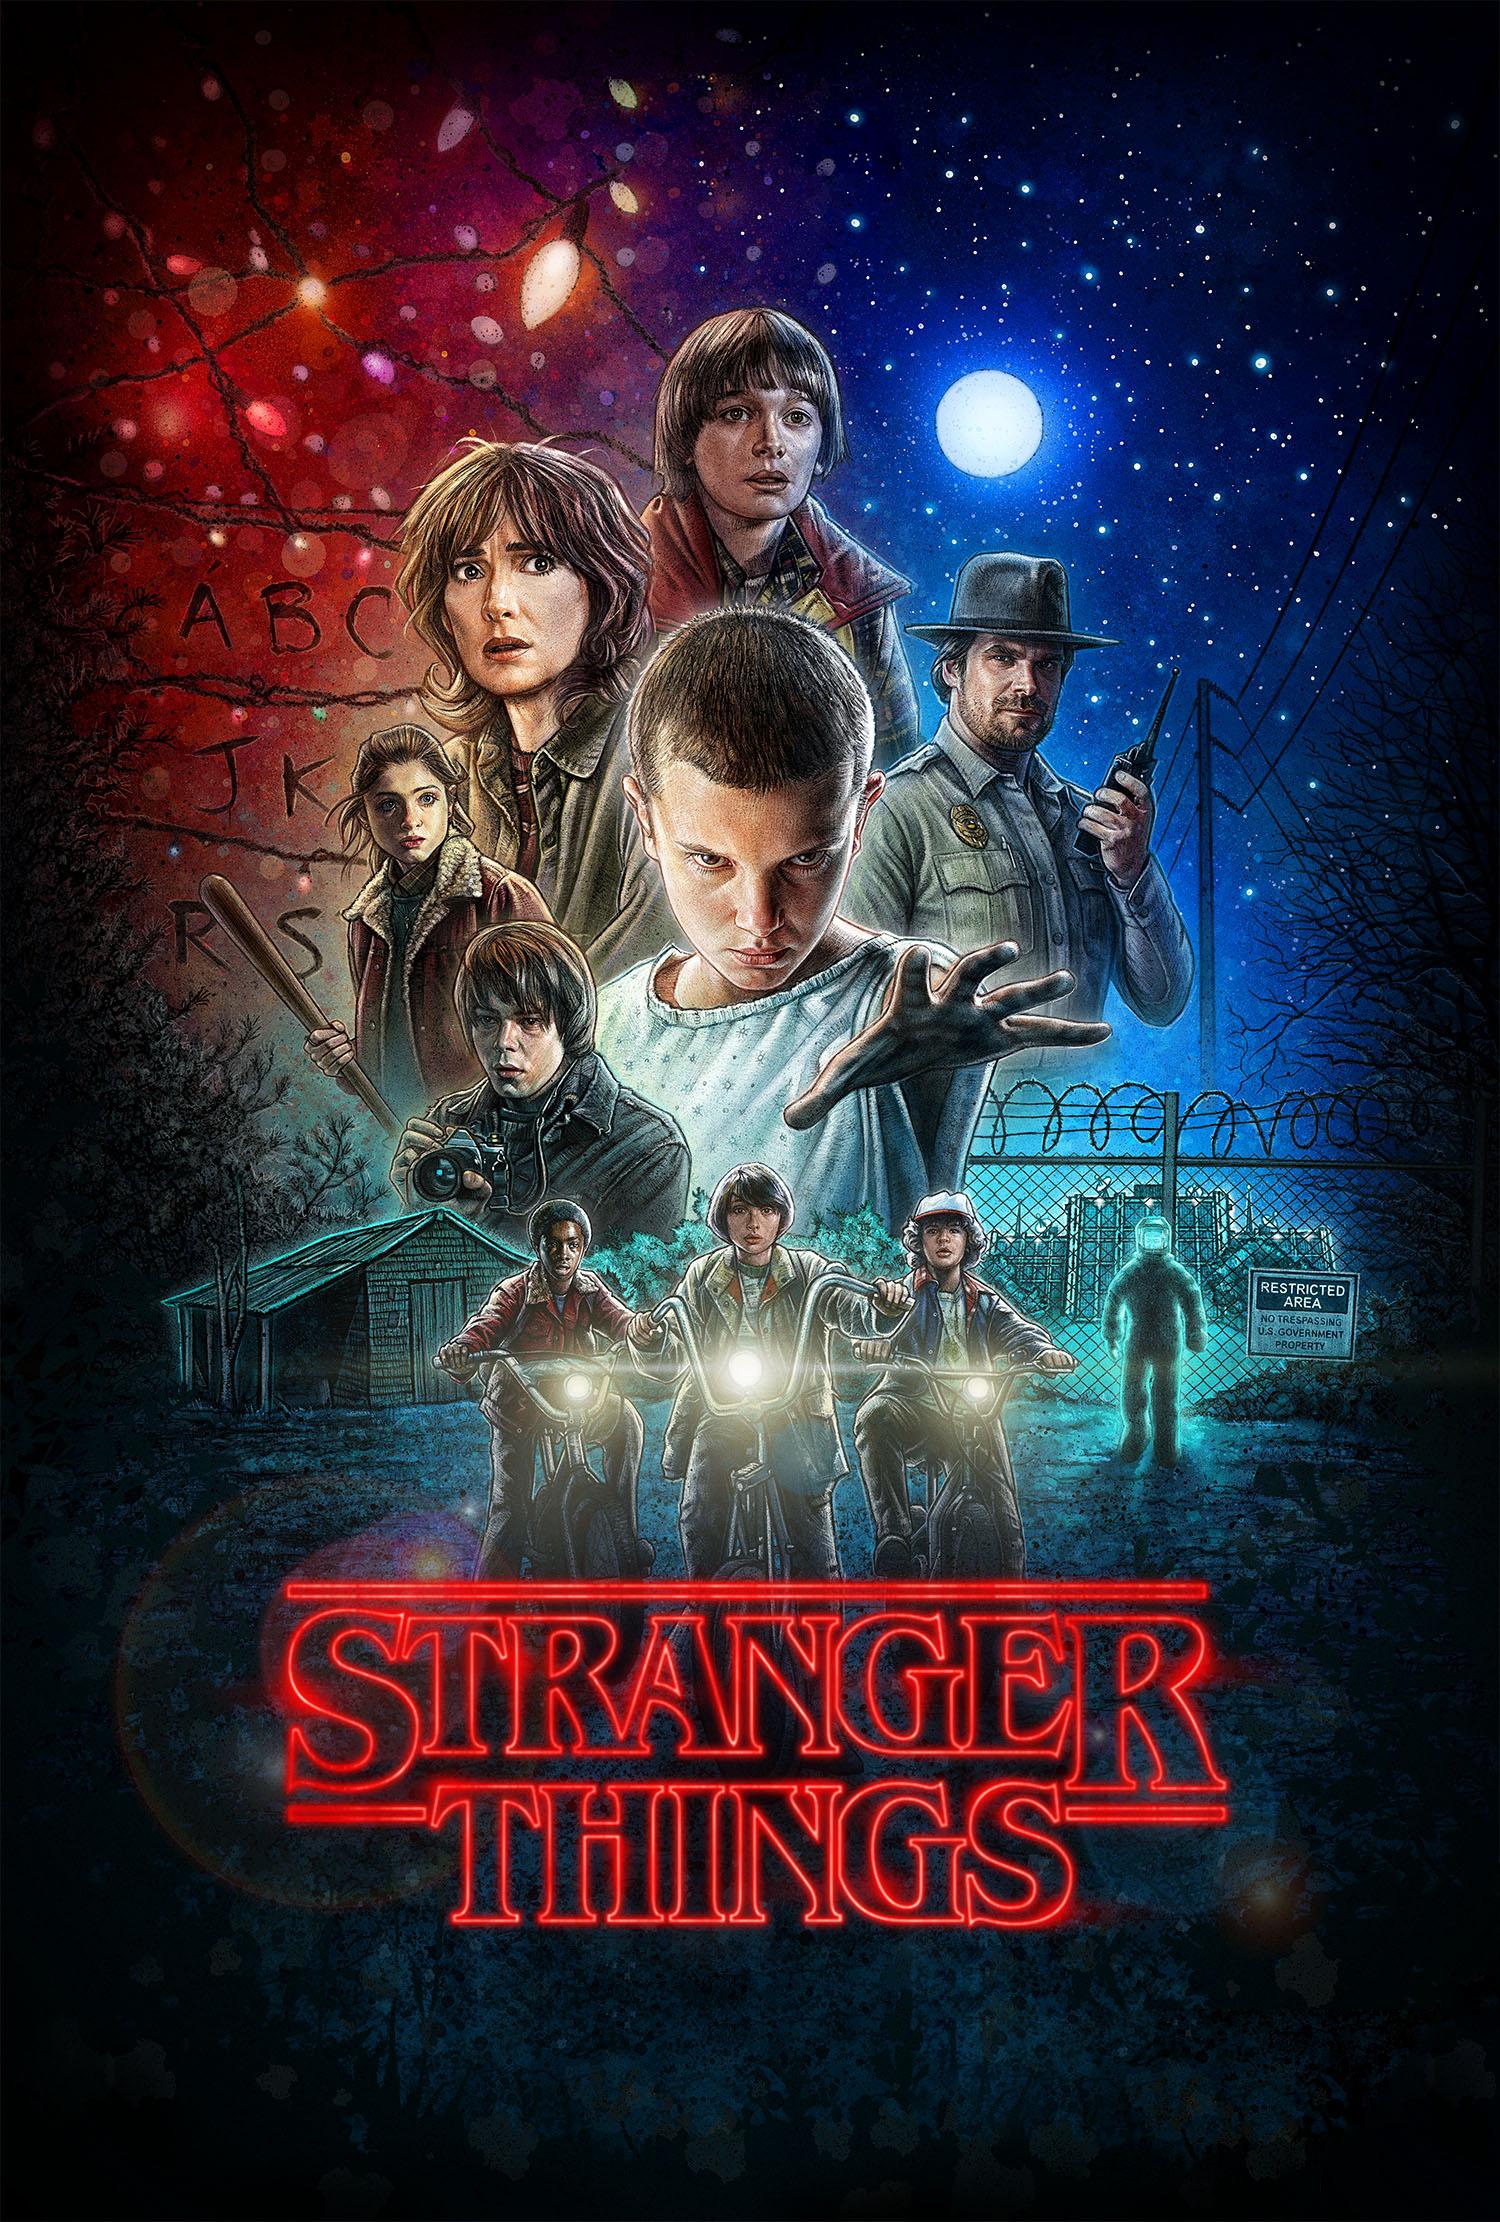 Stranger Things (TV Series 2016– ) - IMDb